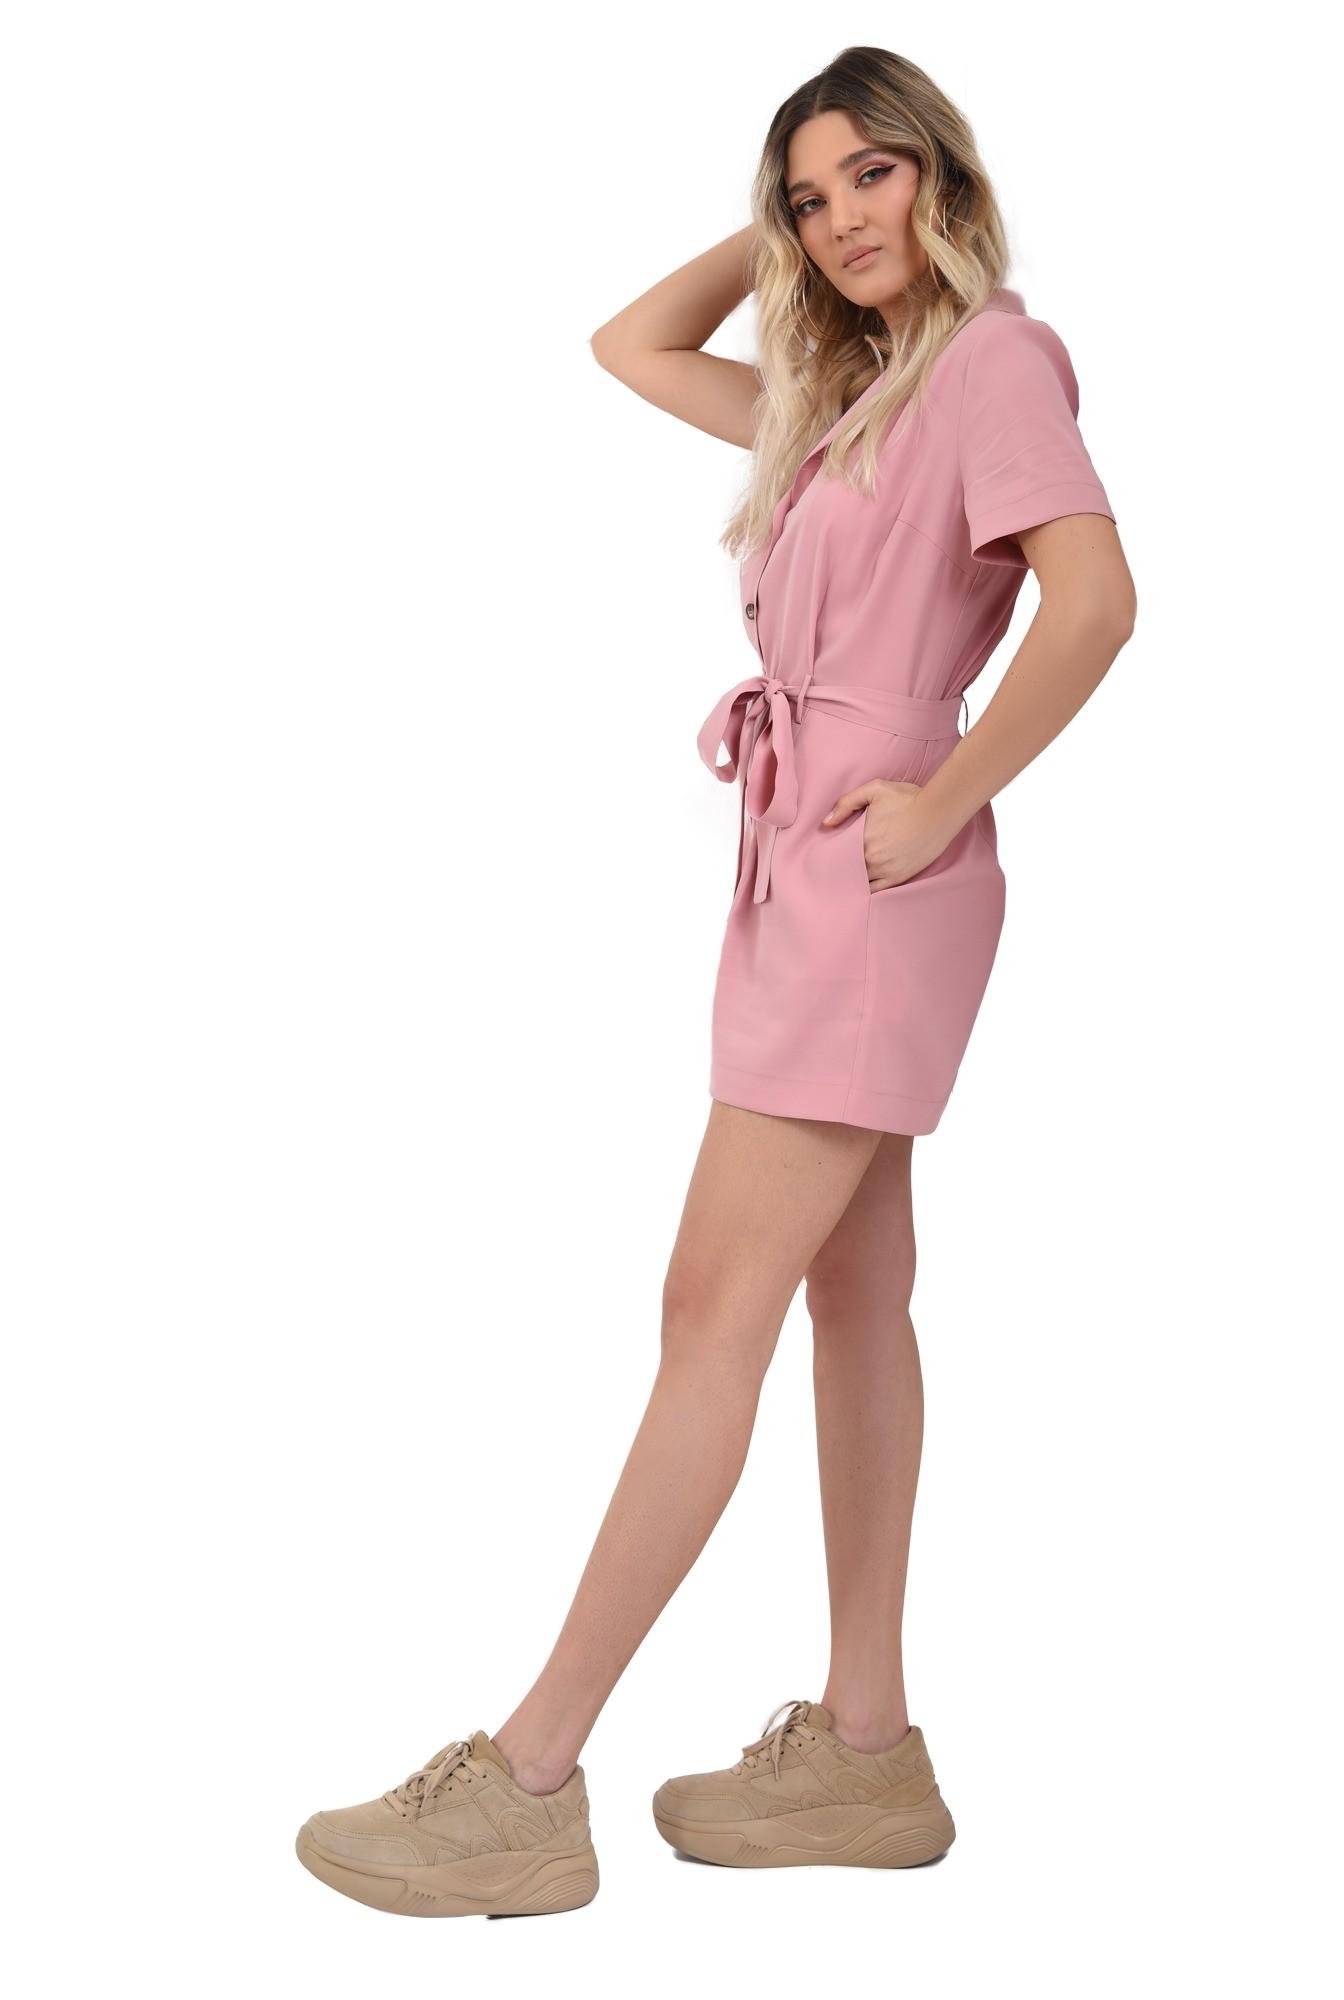 0 - salopeta casual, scurta, cu revere, cu nasturi, cordon, roz